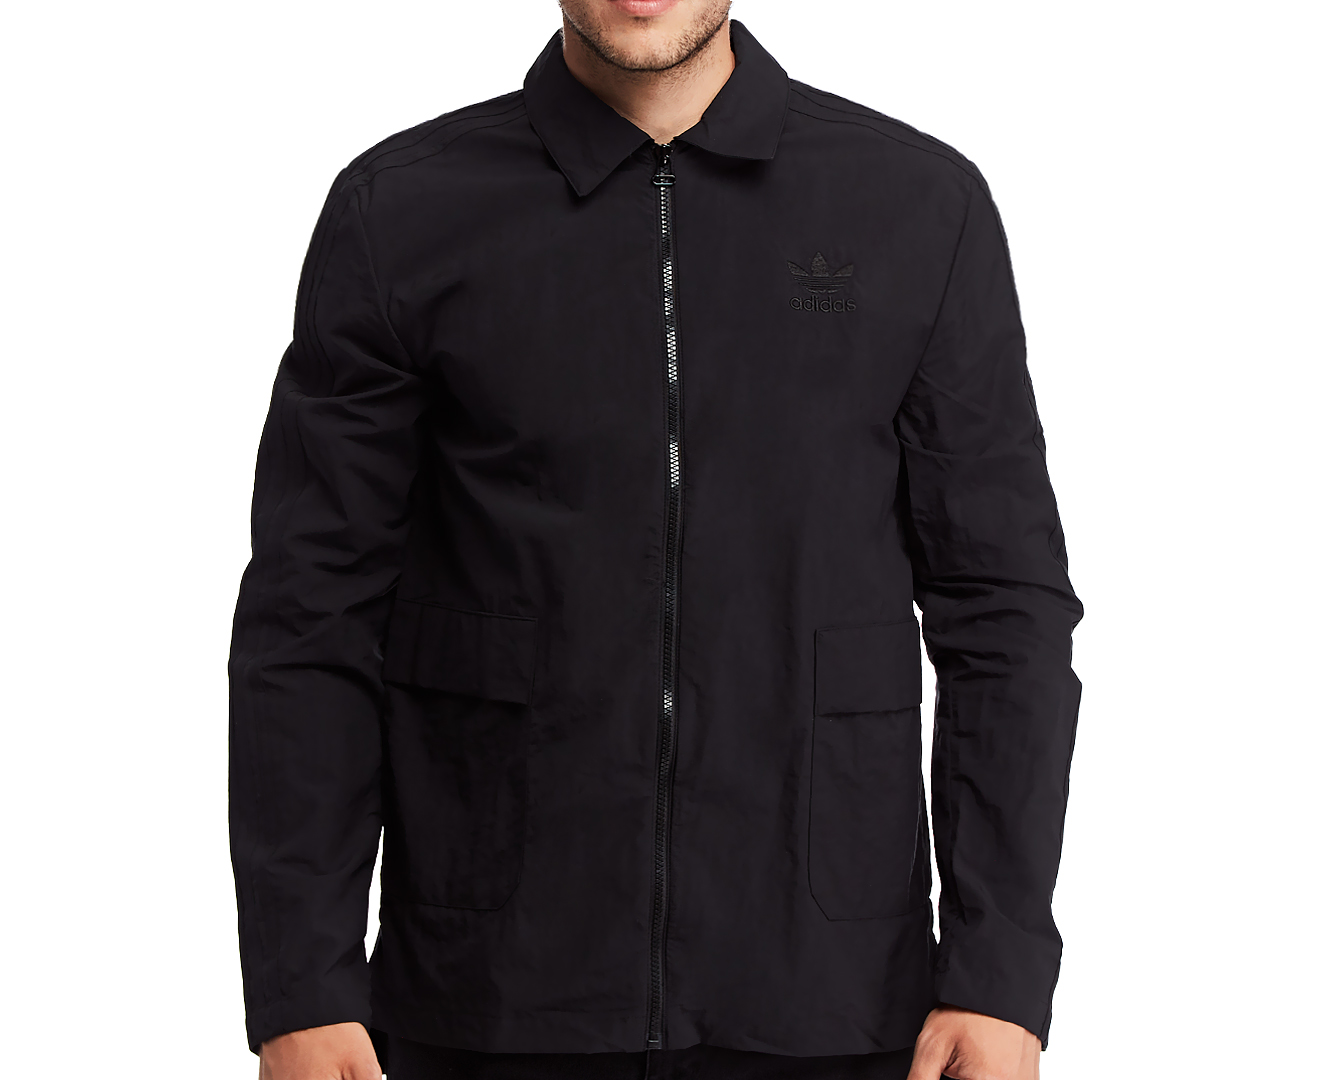 Adidas Originals Men's NYC Coach Jacket Black   .au